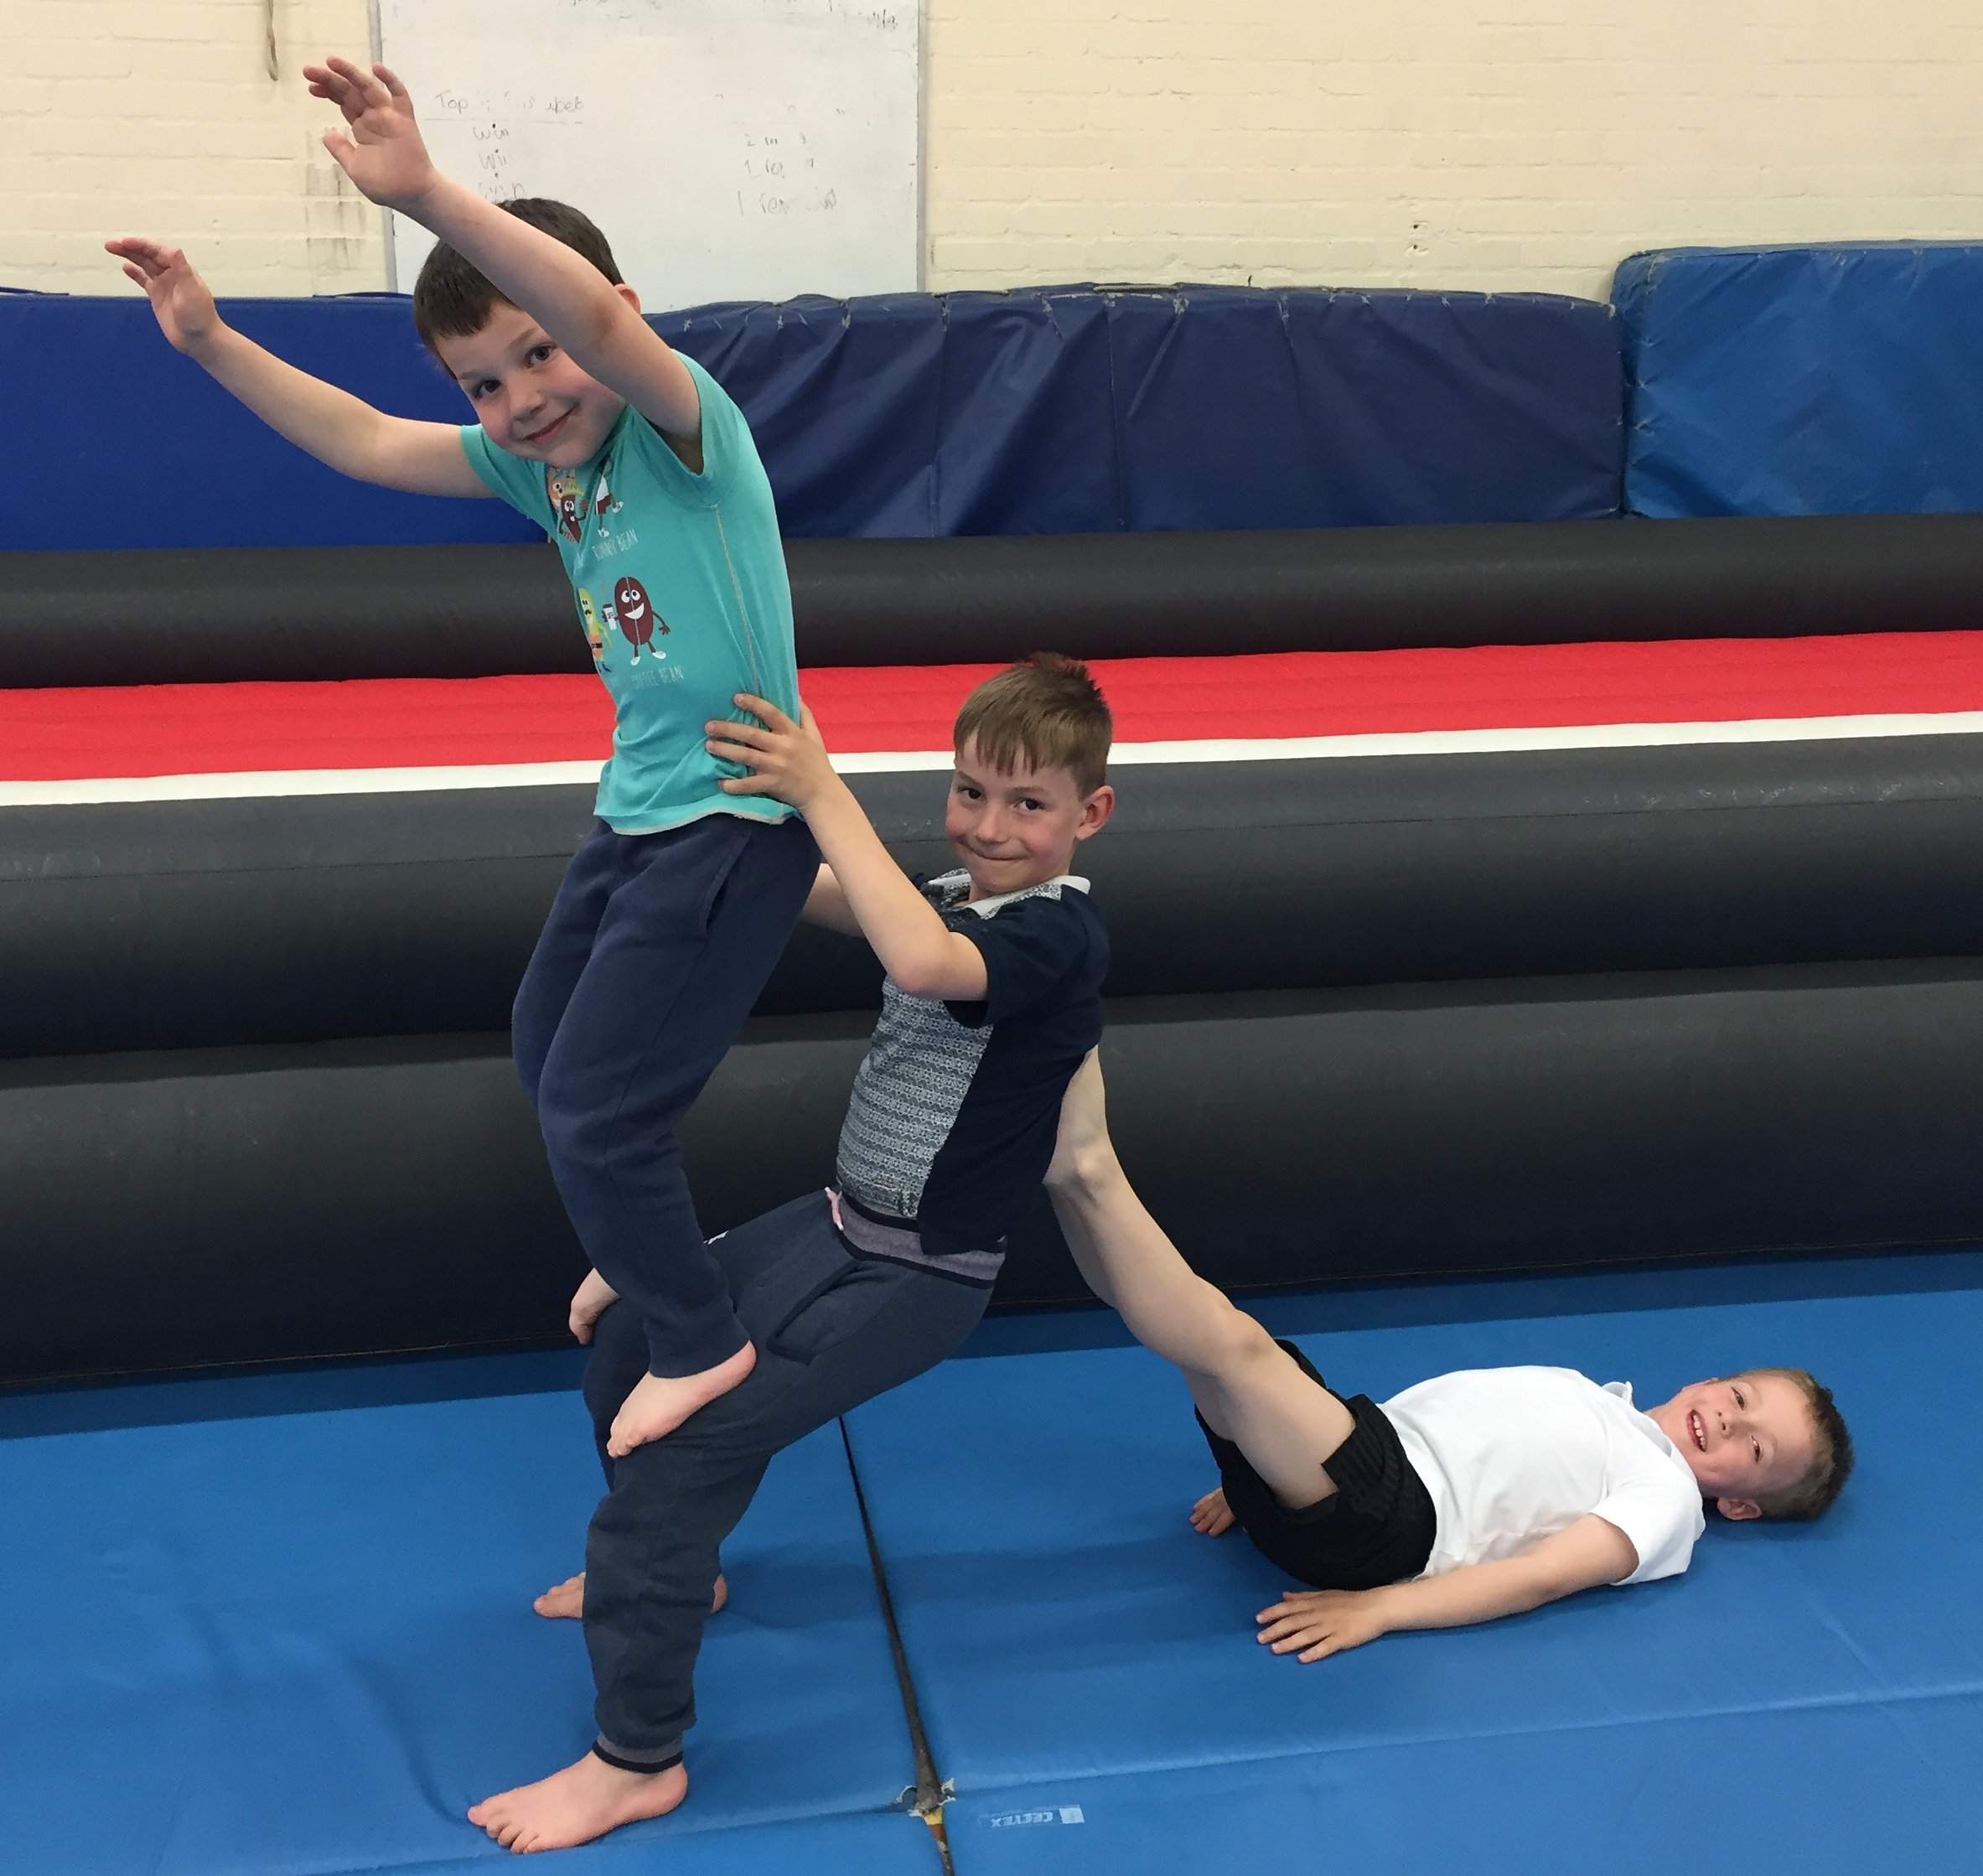 Gymnastics Spring Floor T2k Gymnastics Sprung Floor